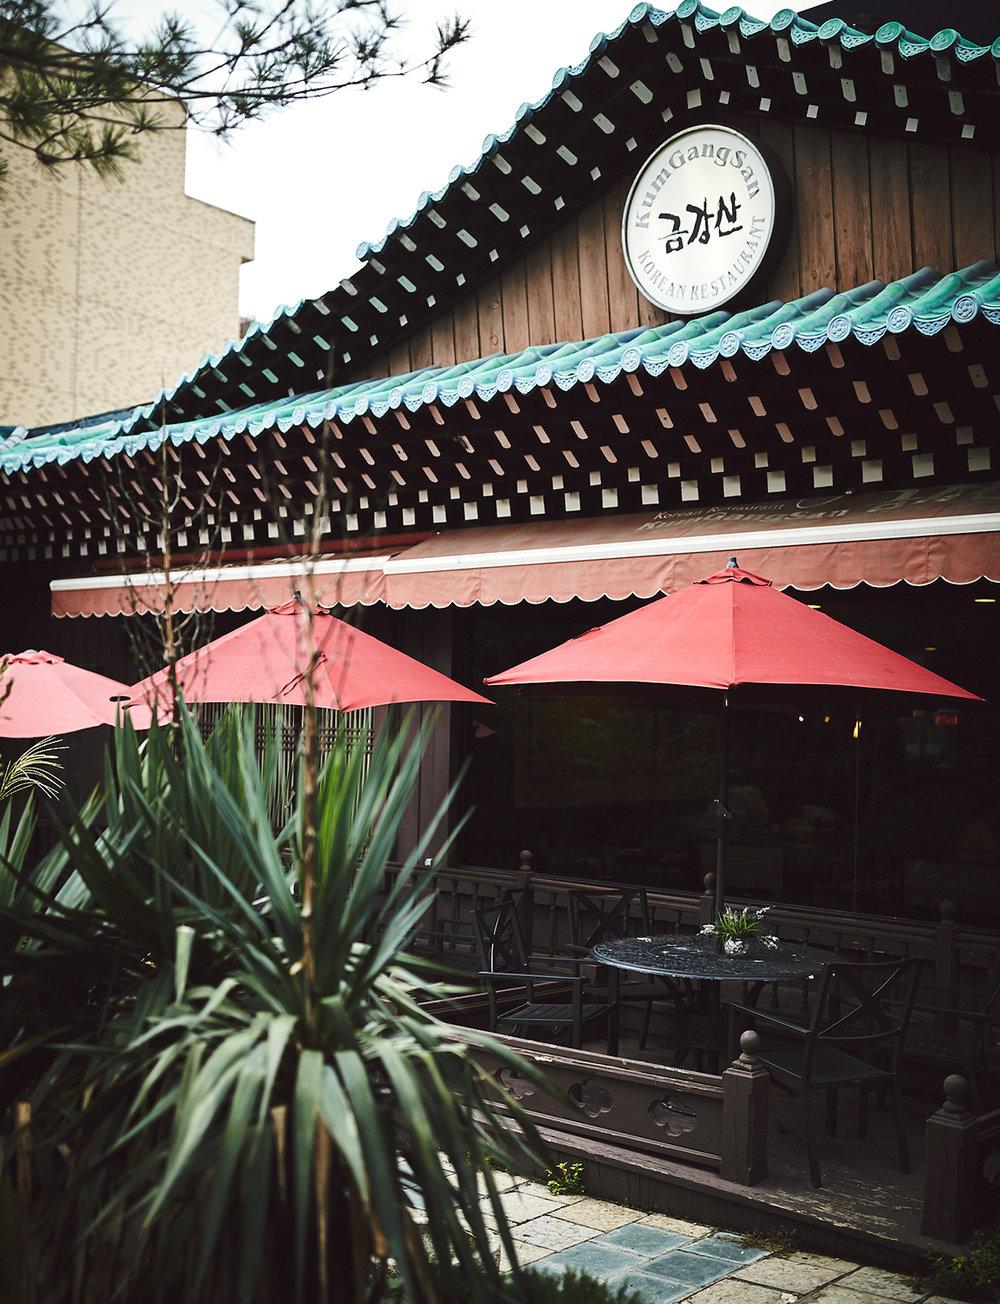 180920_KumGangSanRestaurantQueensPyebaekCeremony_NewYorkWeddingPhotographer_By_BriJohnsonWeddings_0002.jpg